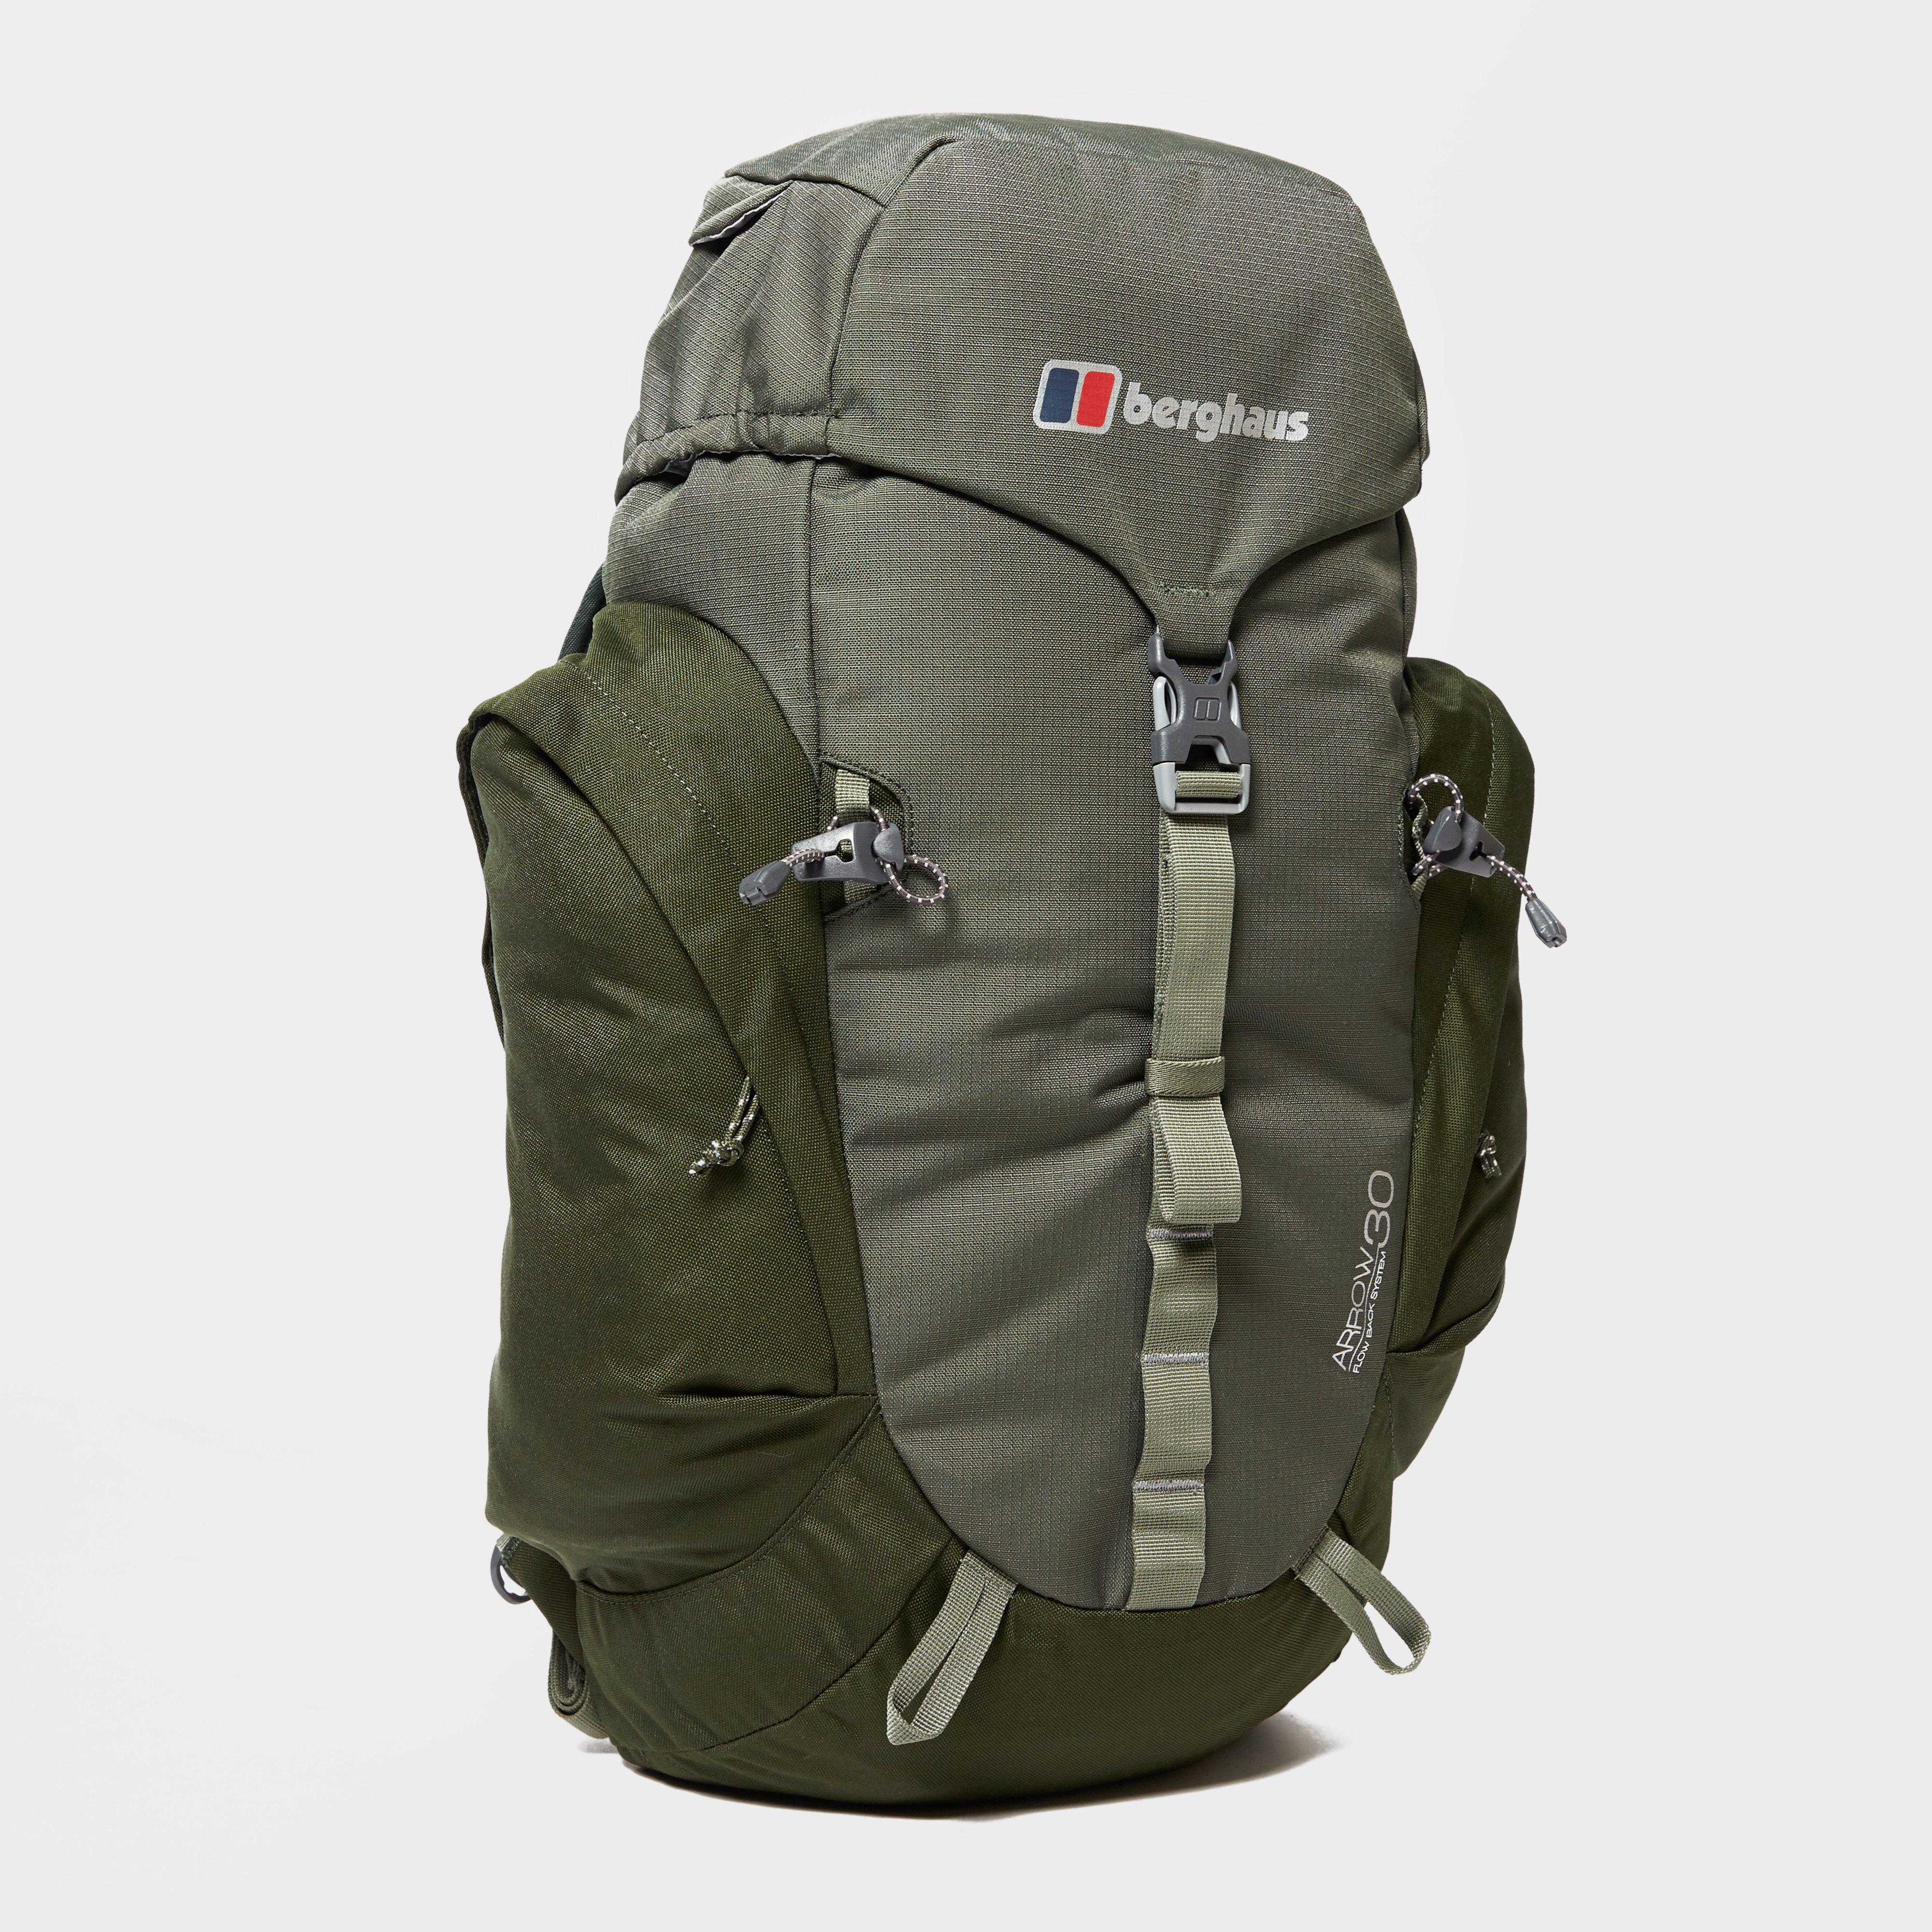 Berghaus Arrow 30l Backpack - Khaki/grn  Khaki/grn